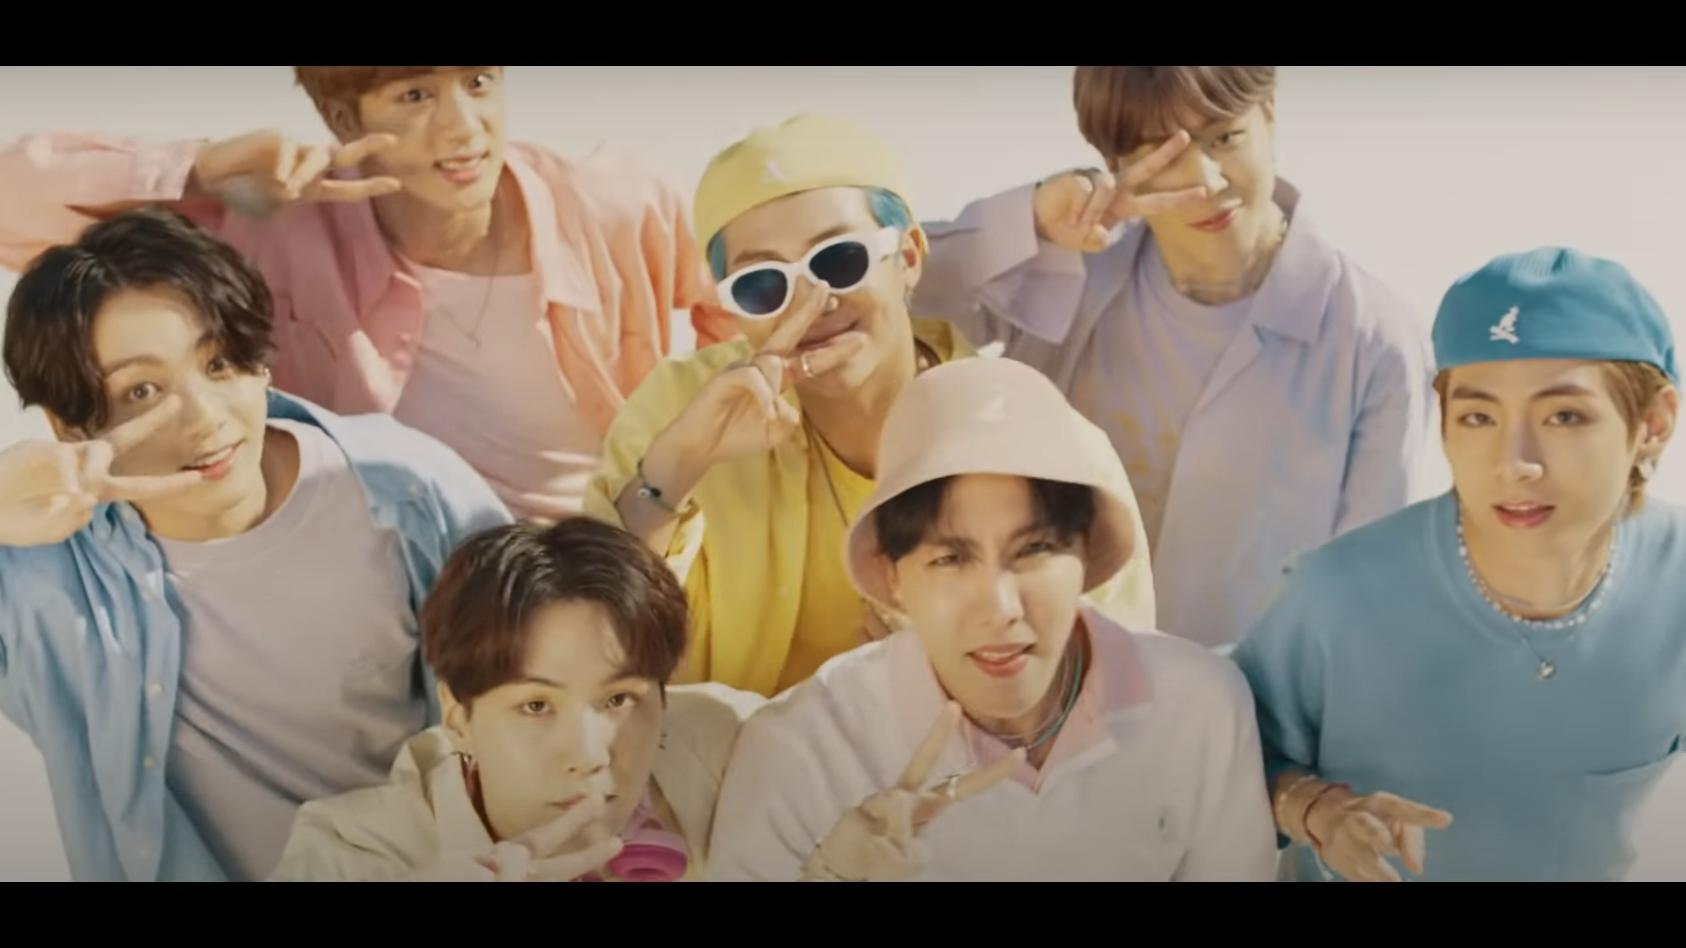 BTS 'Dynamite' Tops 20 Billion Views on YouTube   Variety